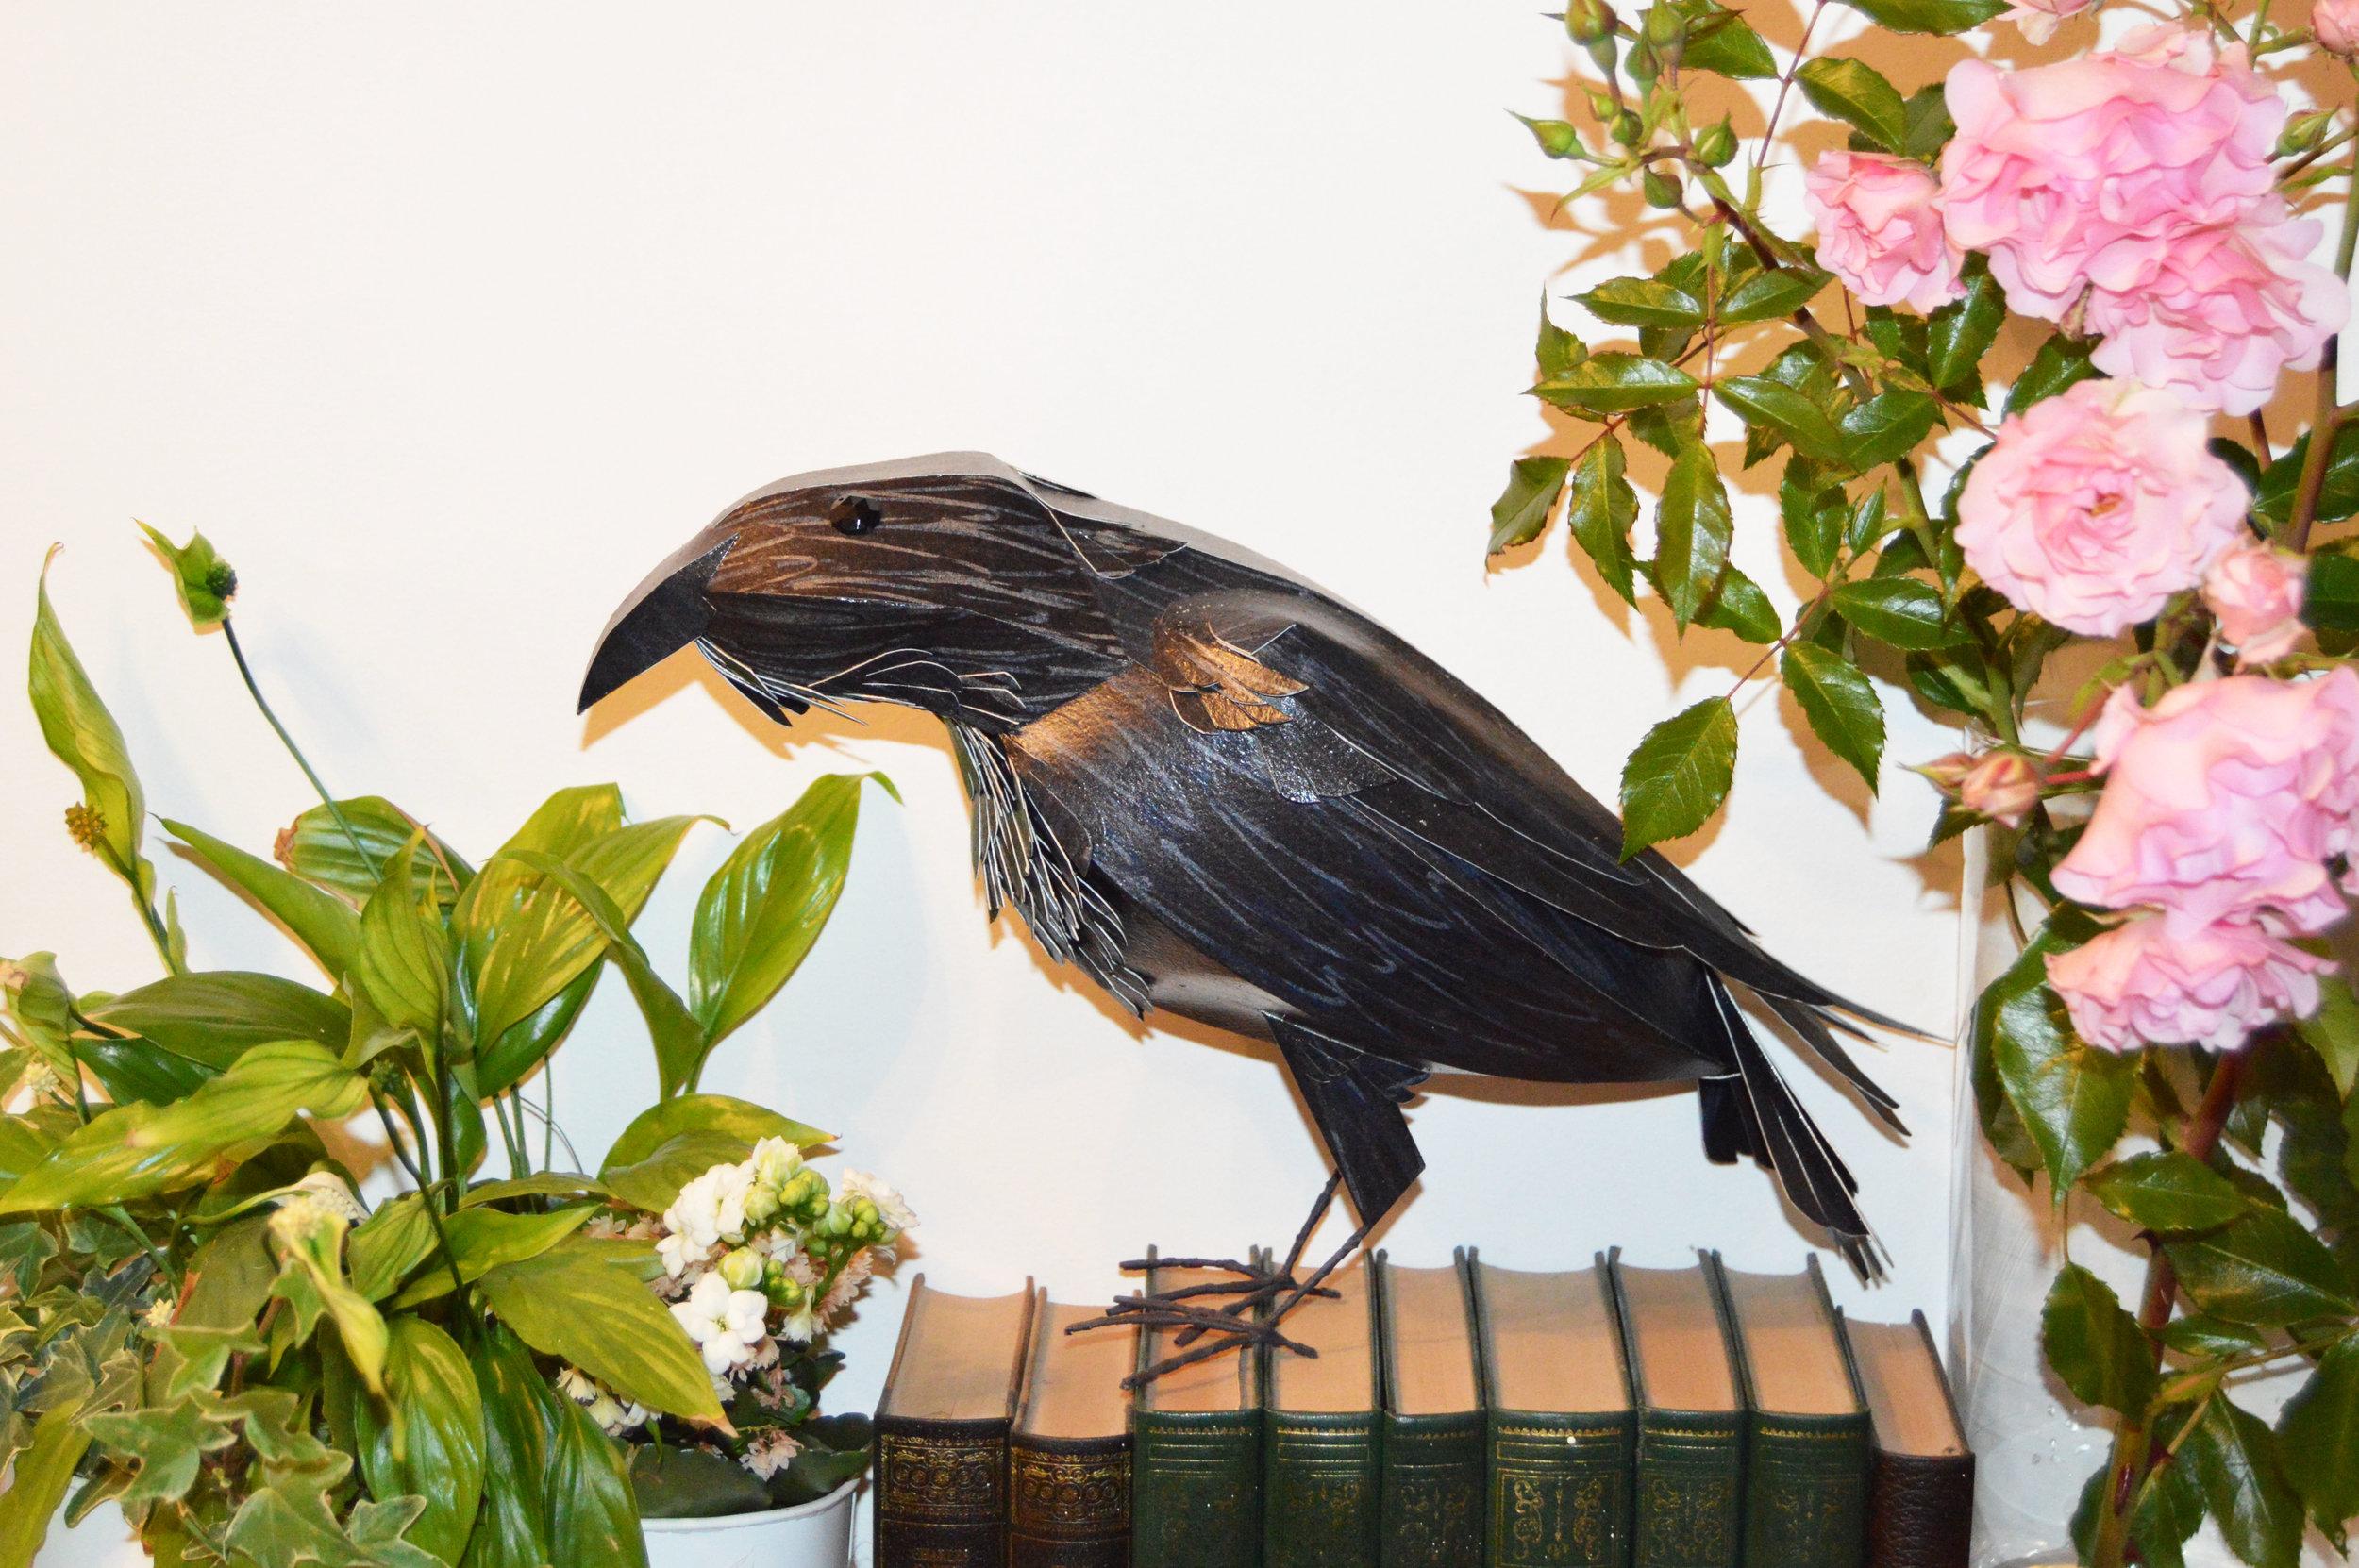 Edgar the Raven